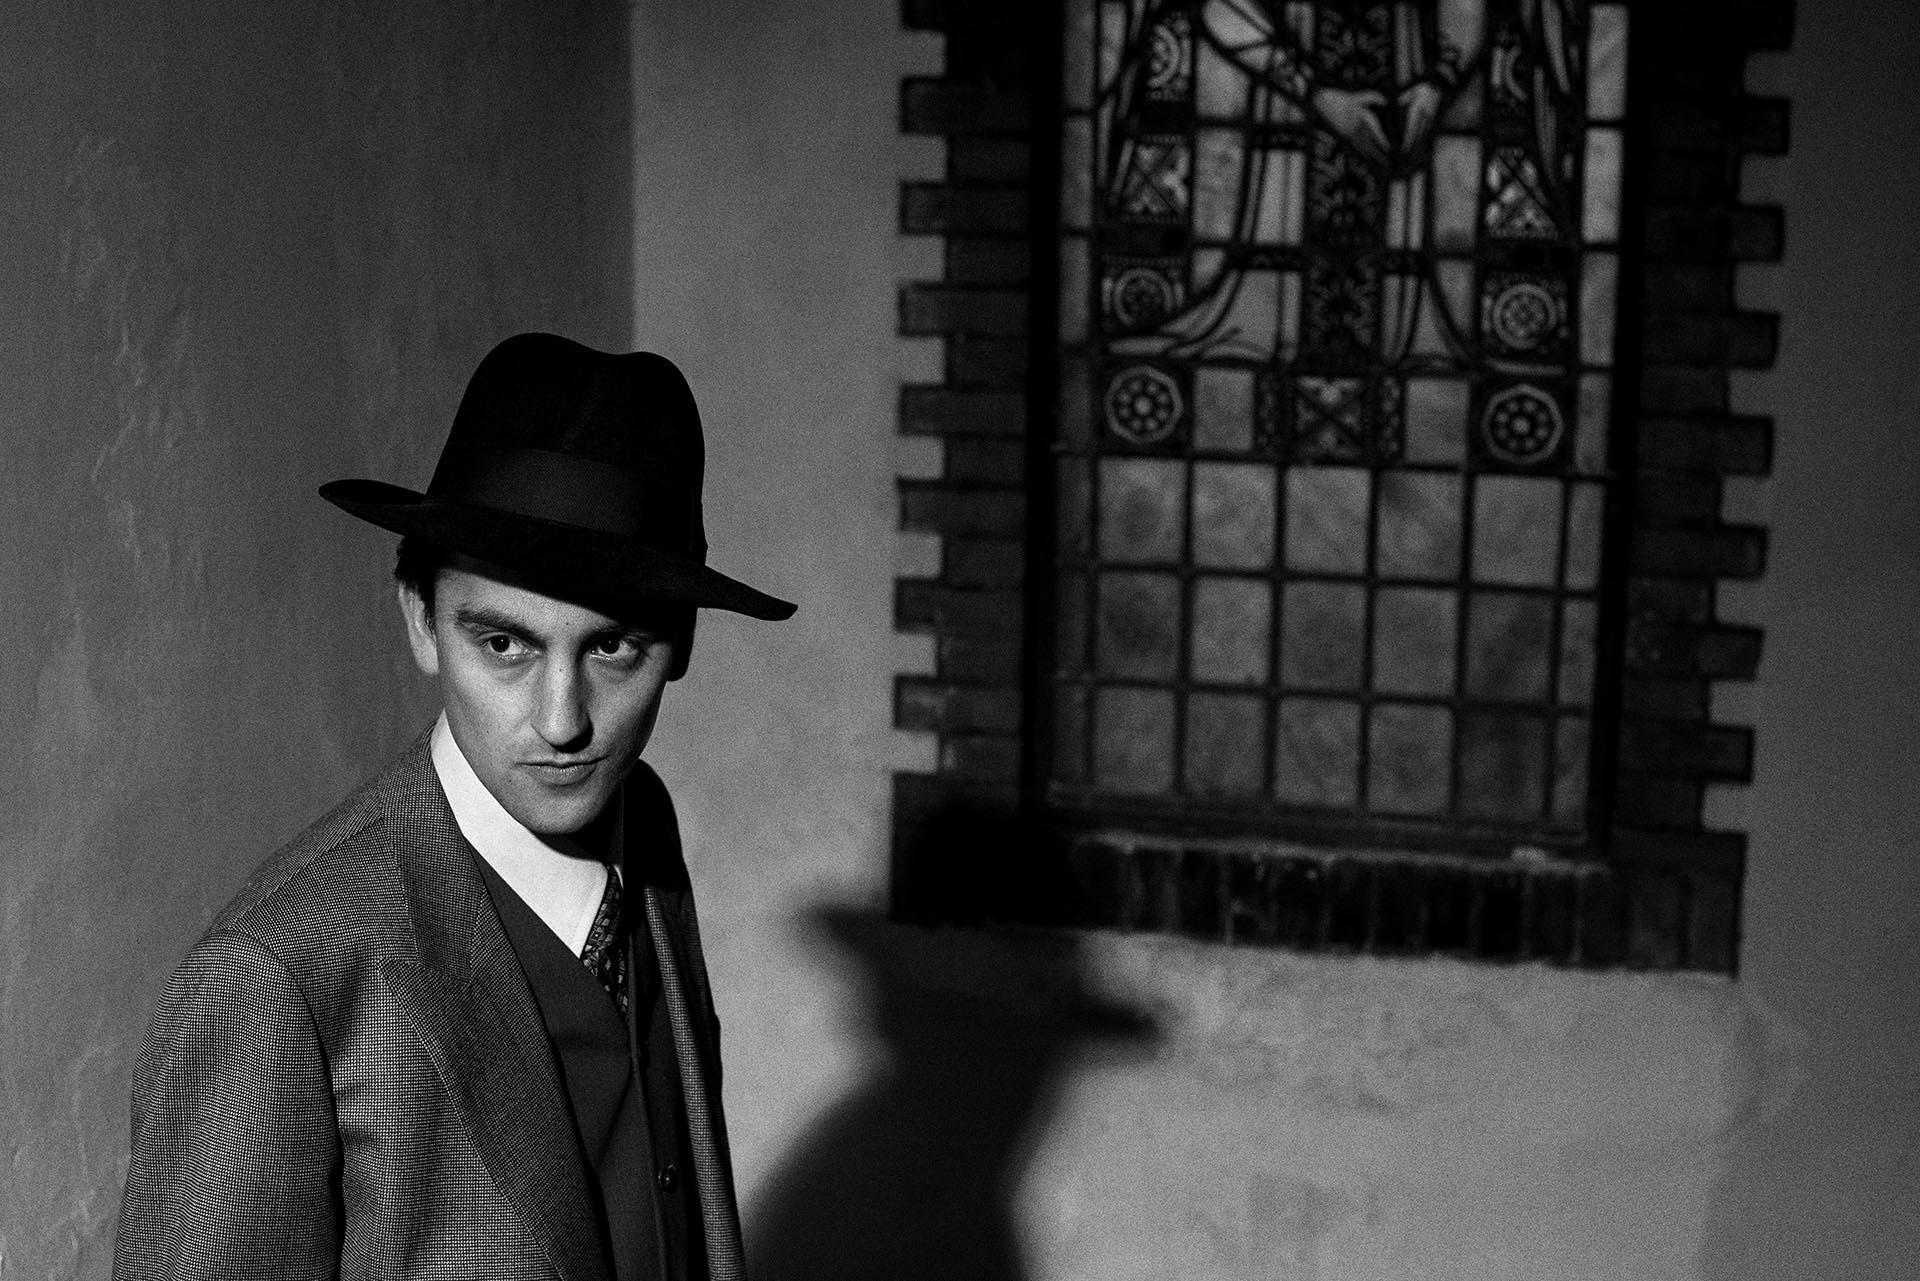 Out of the Moonlight | film noir | Robert van der Ree Photography